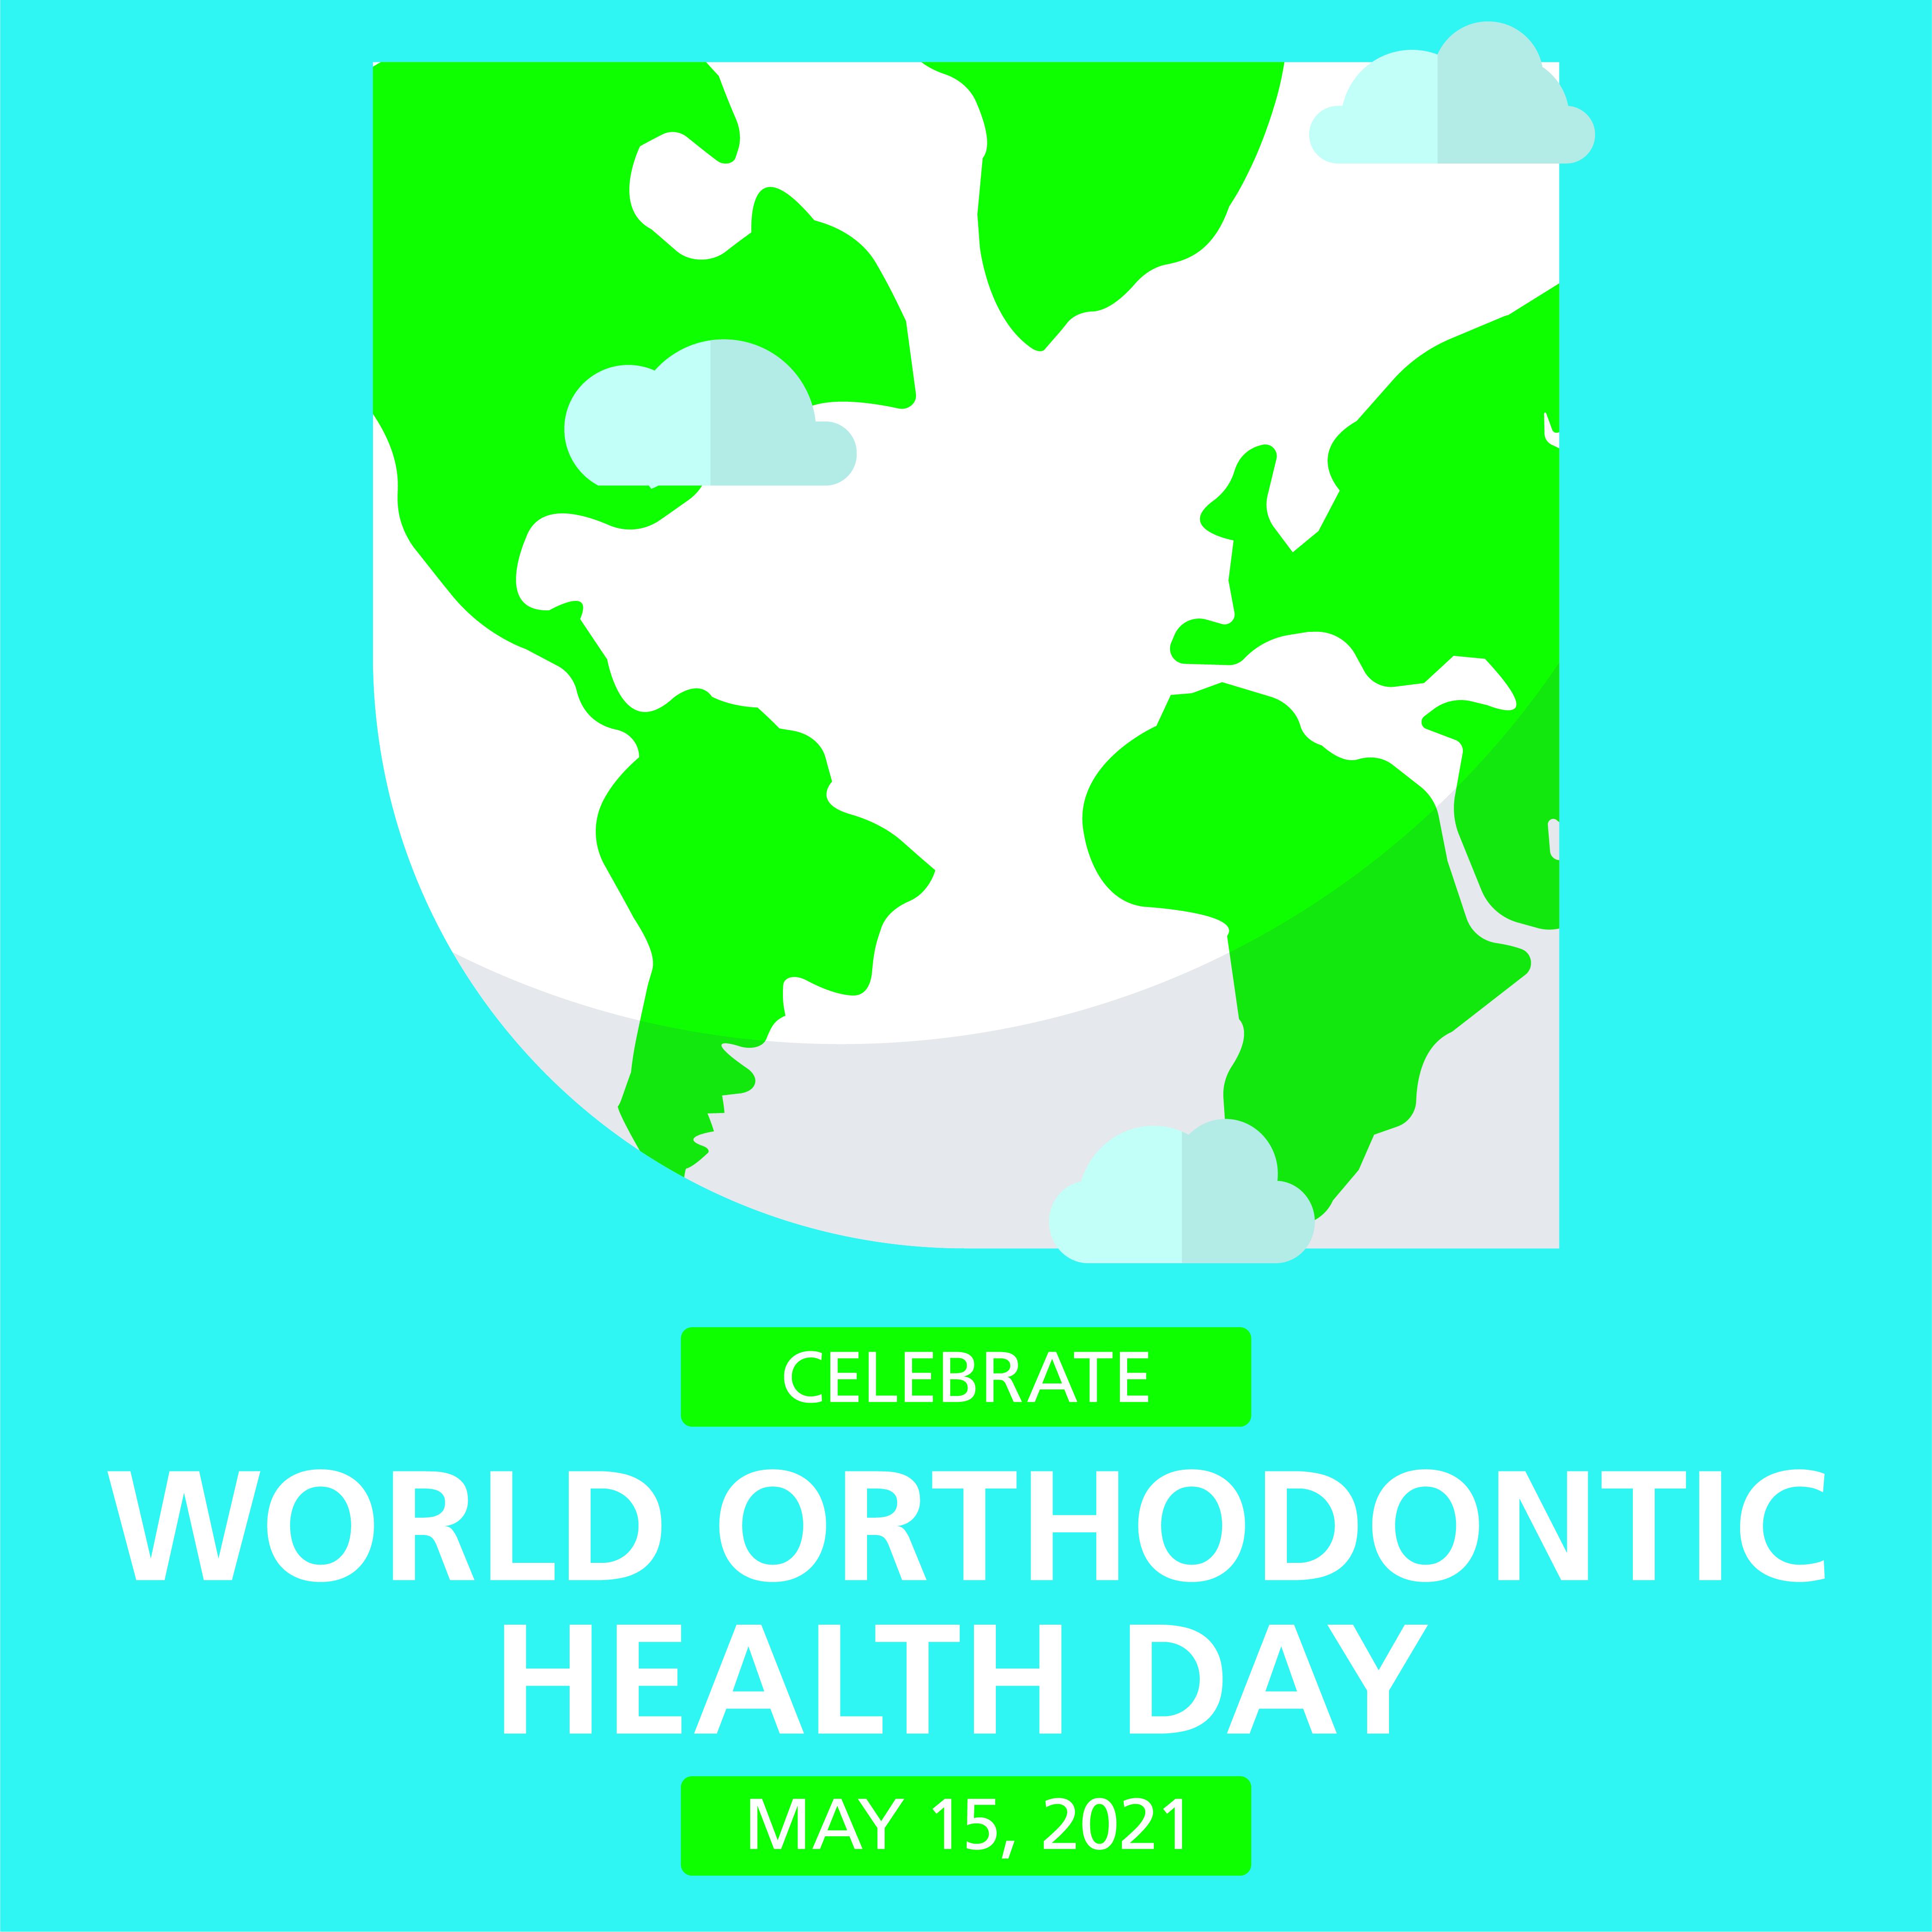 GH World Orthodontic Health Day 2021 - Instagram 1080X1080 - No Braces-01